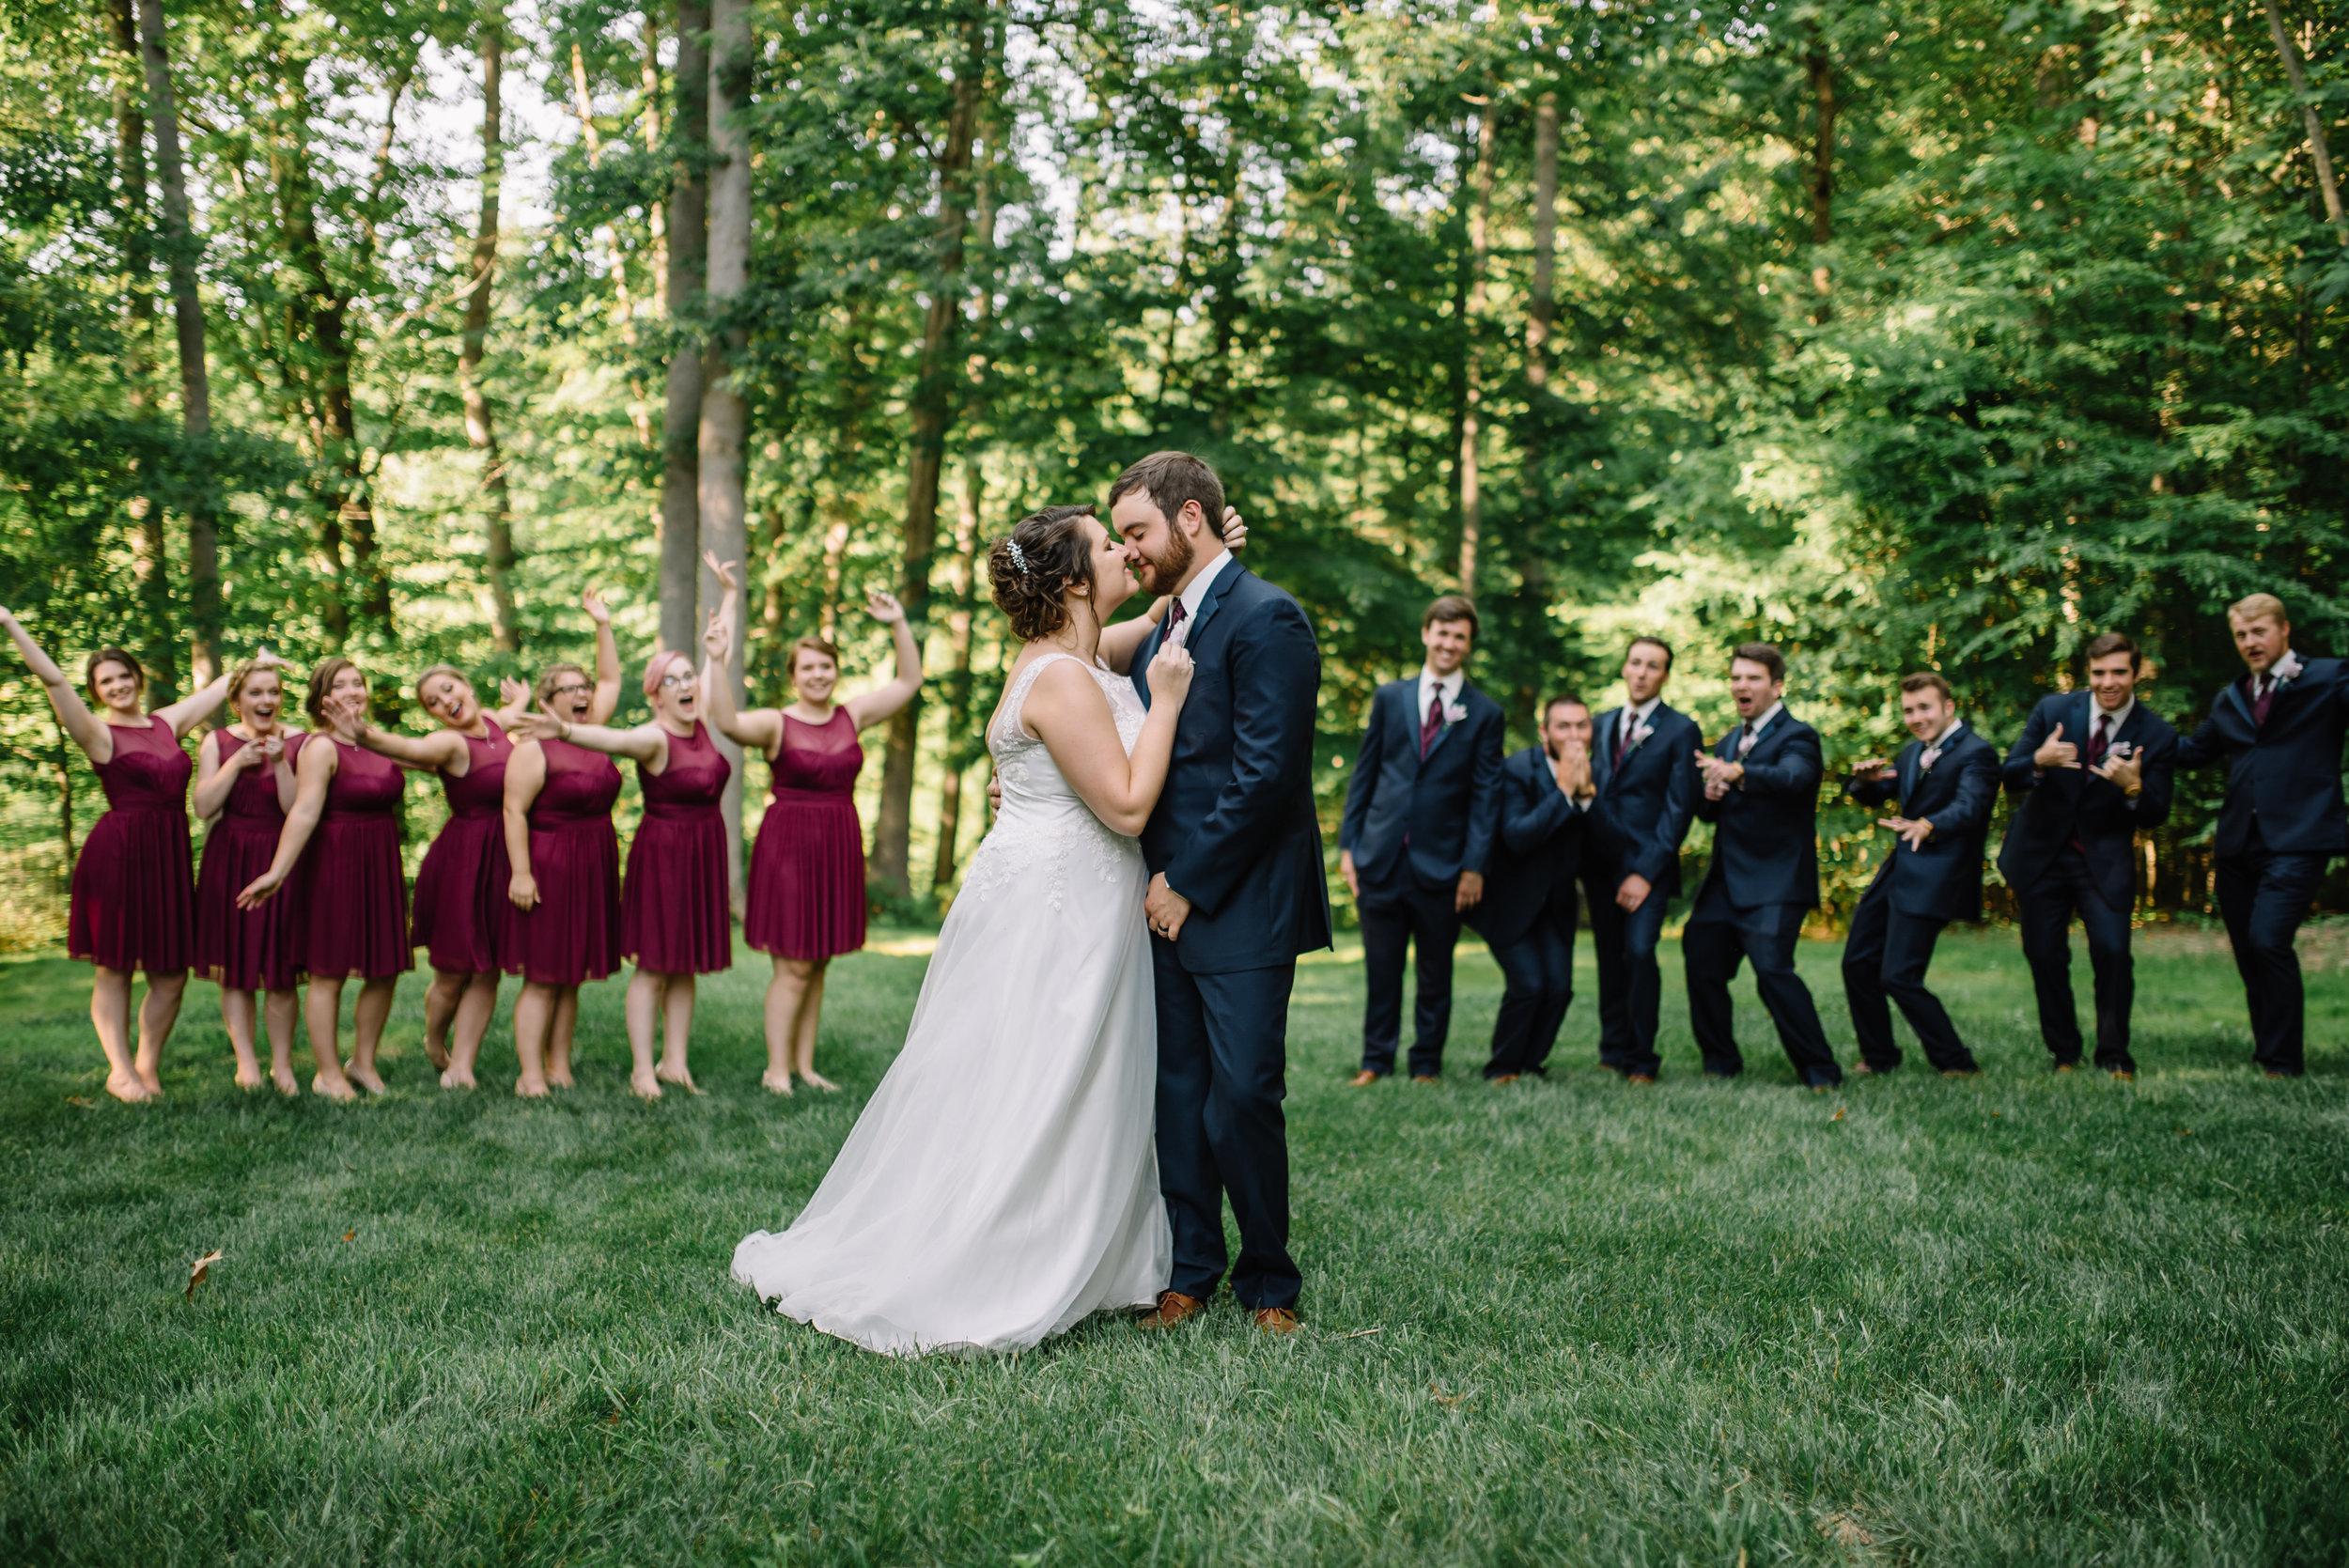 Becca and Greg Thorn Wedding 06 10 2017-Becca s Favorites-0127.jpg